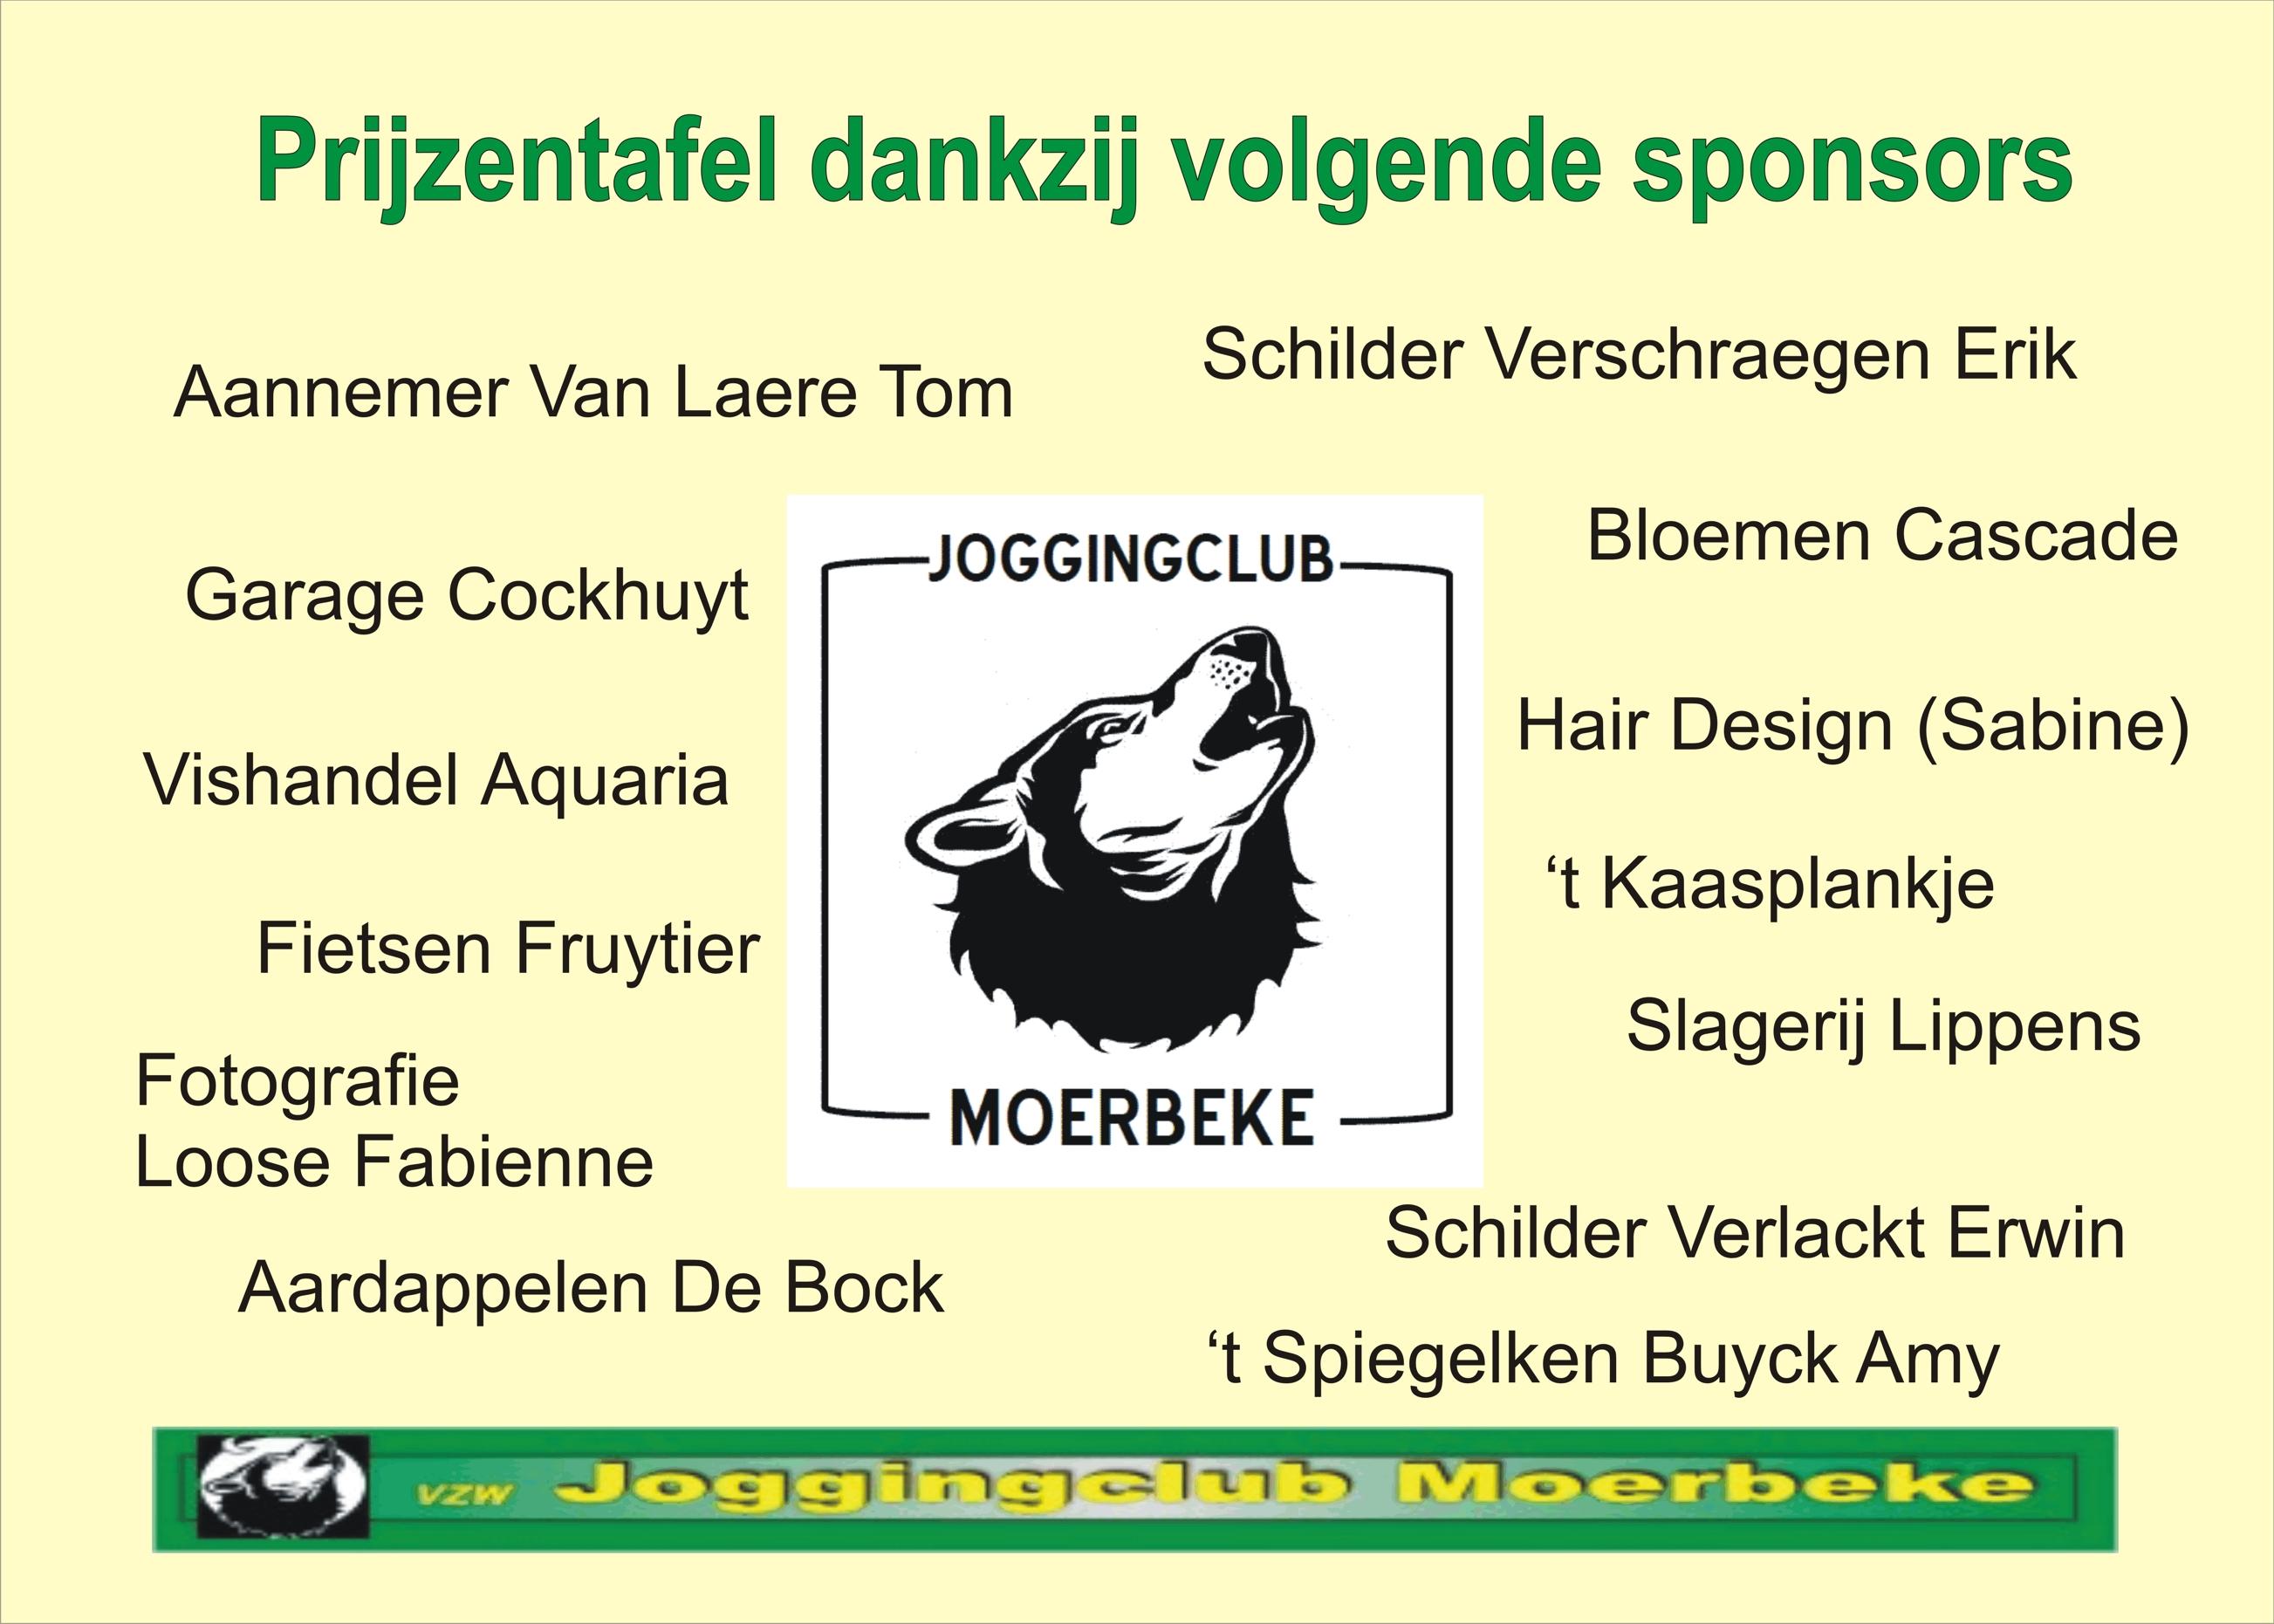 http://www.joggingclubmoerbeke.be/2014/mhl/mhlspons01.jpg